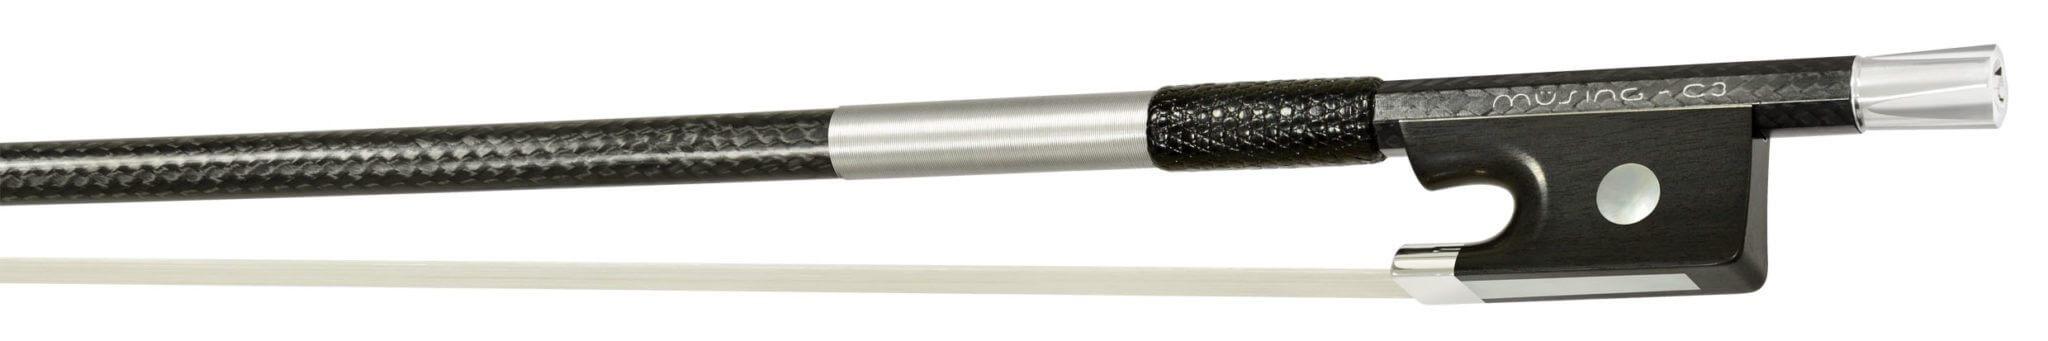 Müsing carbon fiber vioolstrijkstok C3